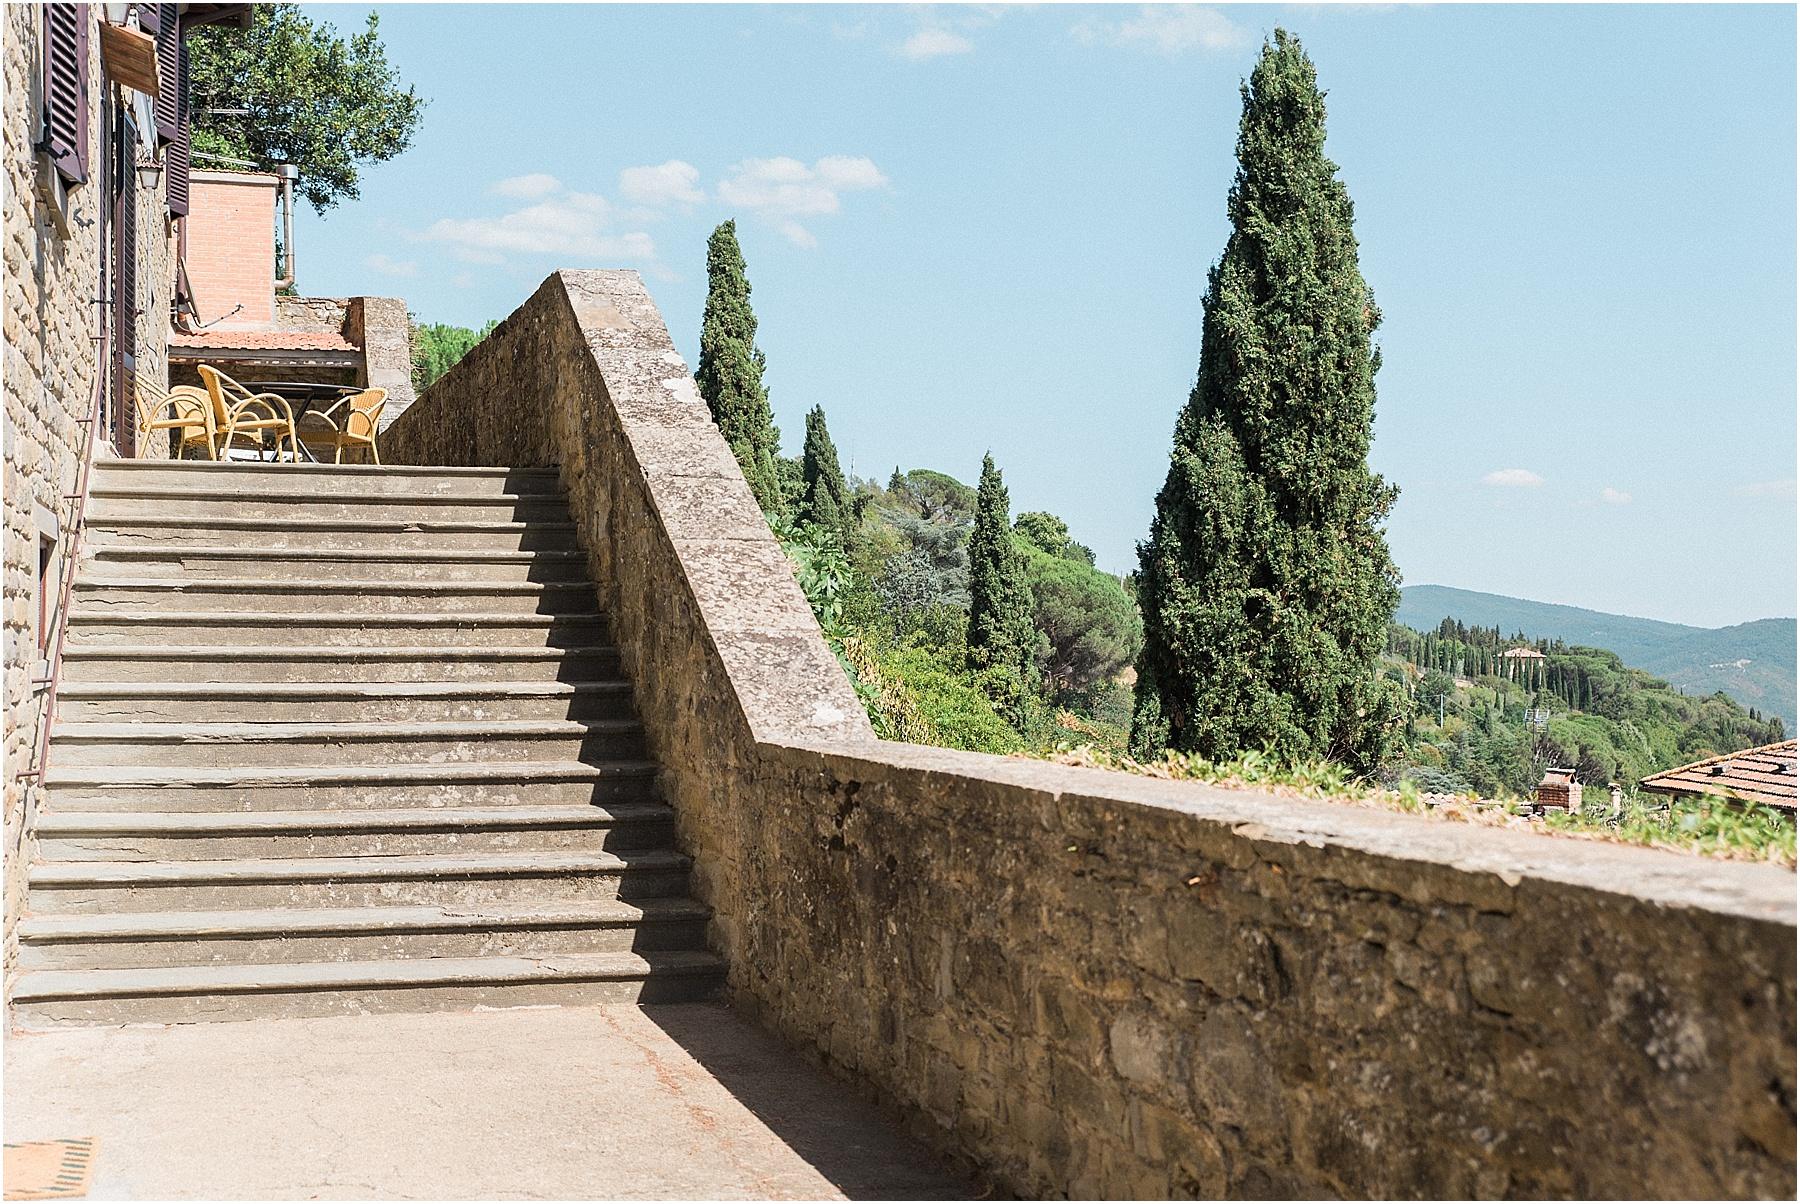 villa in cortona tuscany italy stone medieval stairs leading to wedding villa cypress trees